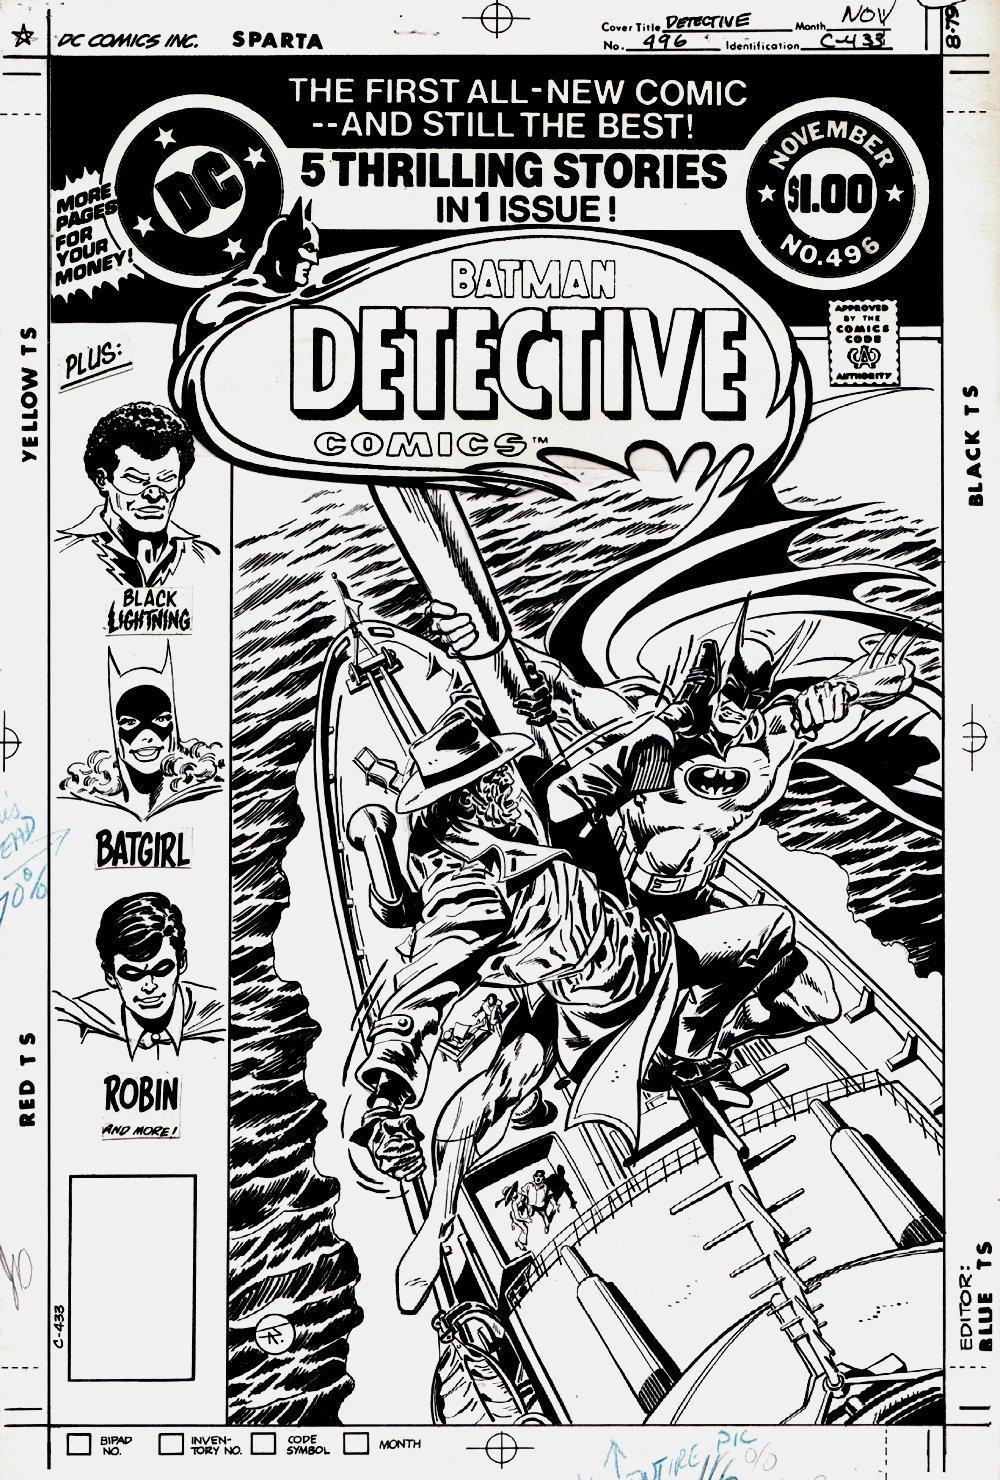 Detective Comics #496 Cover (BATMAN BATTLES CLAYFACE!) 1980